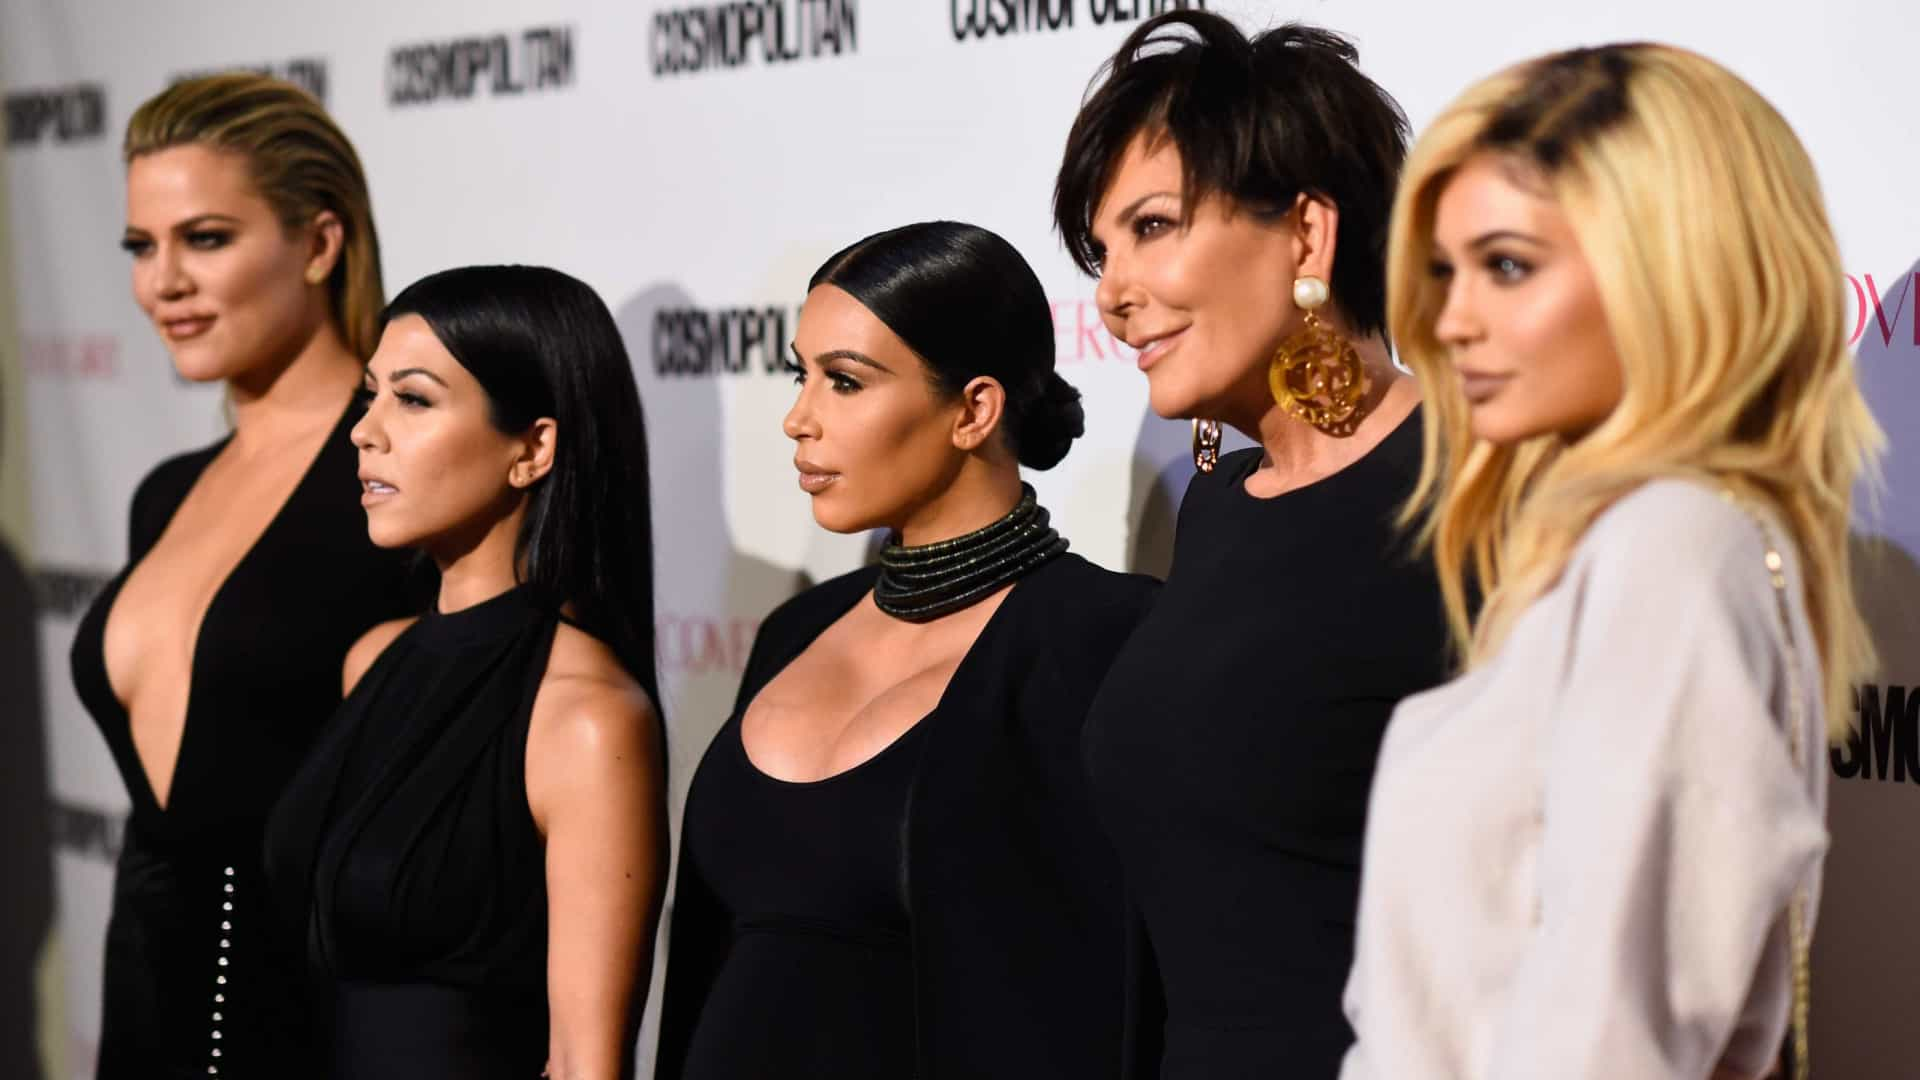 Irmãs Kardashian celebraram aniversário da mãe